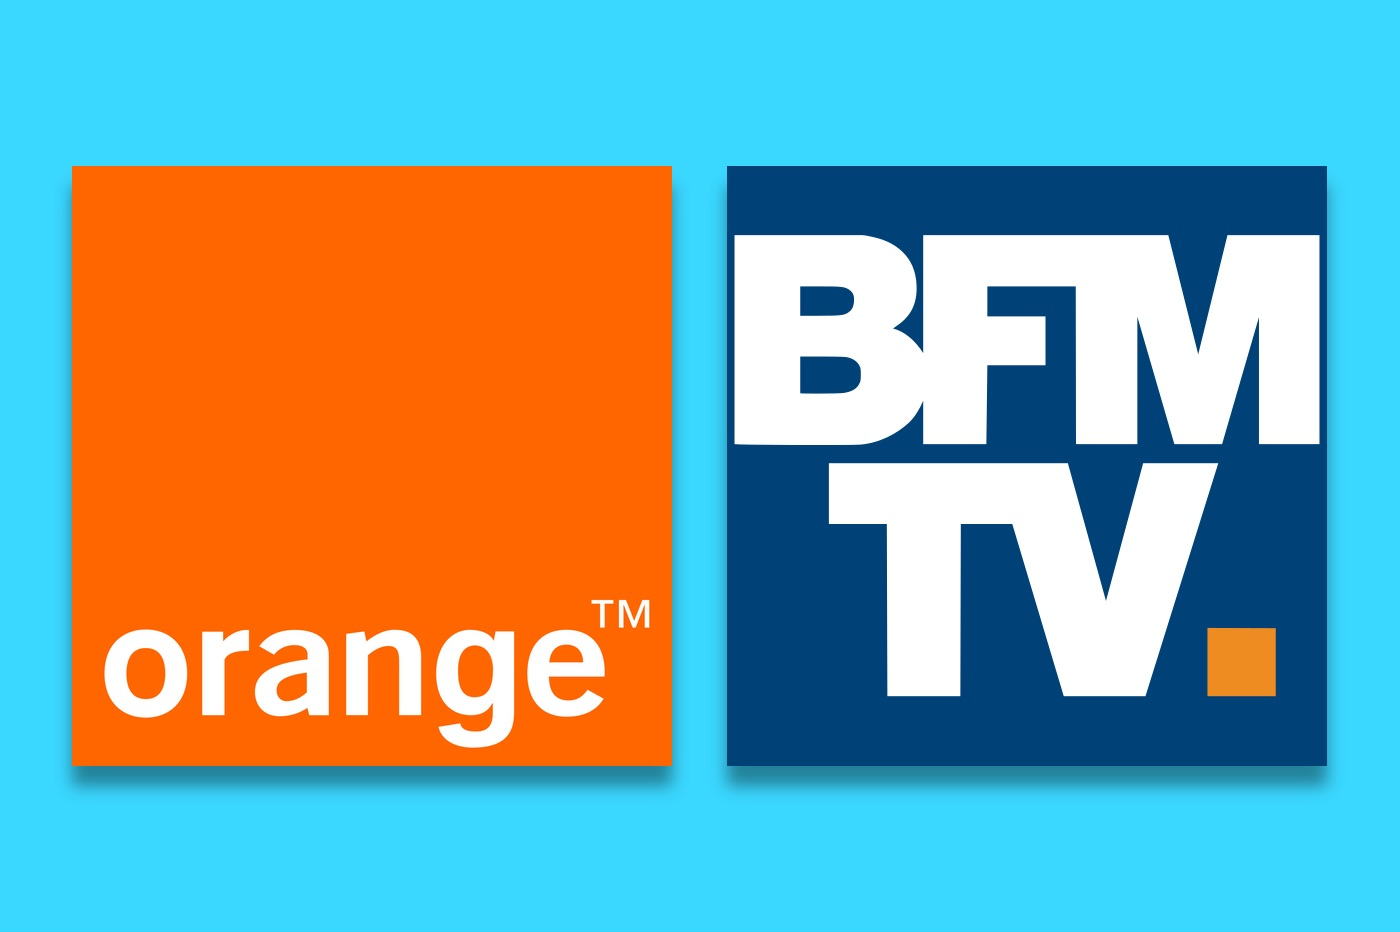 Bataille Orange et BFM TV